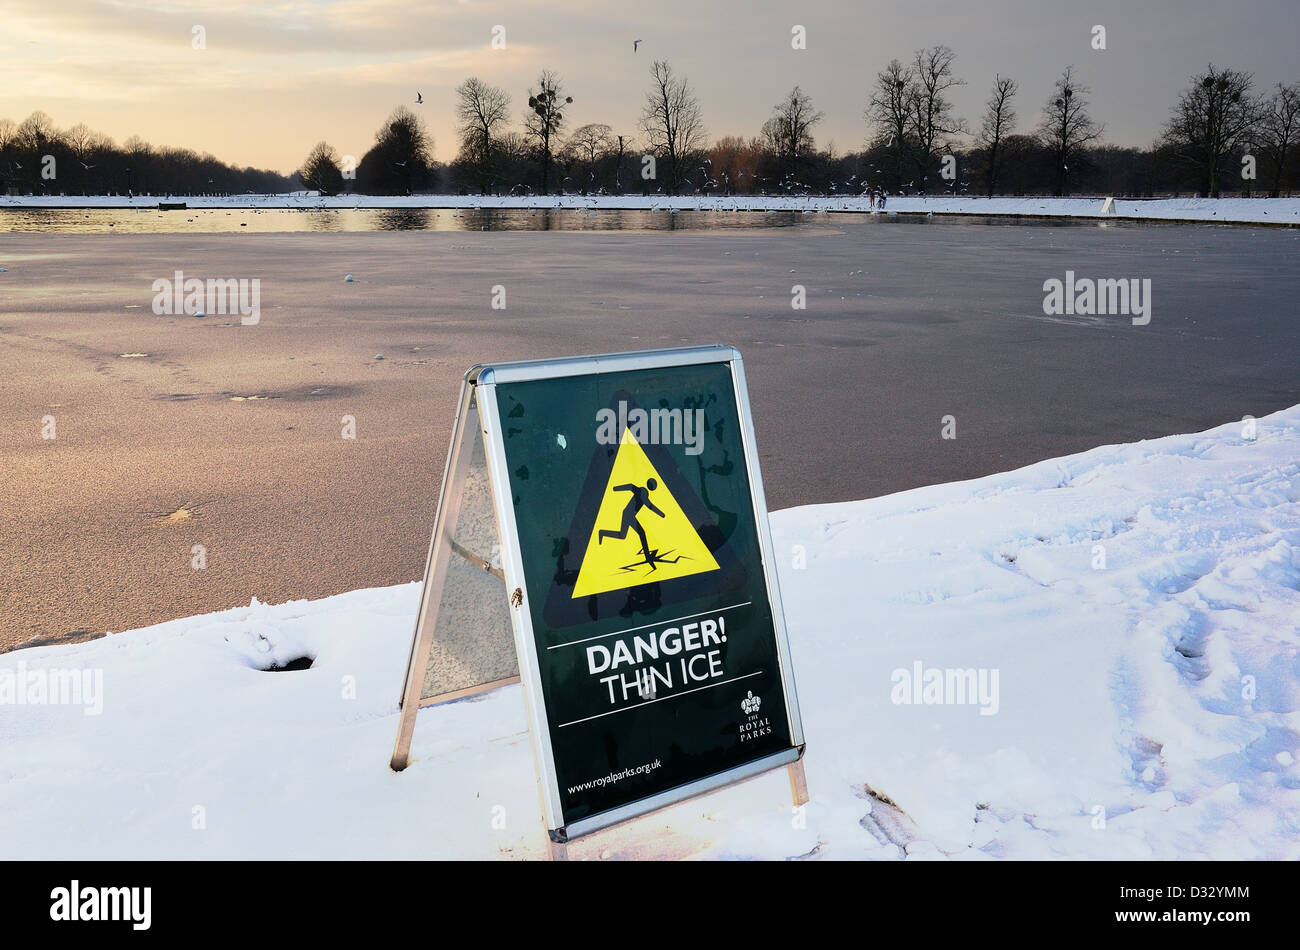 Warning sign 'Danger Thin Ice' in Bushey Park London - Stock Image